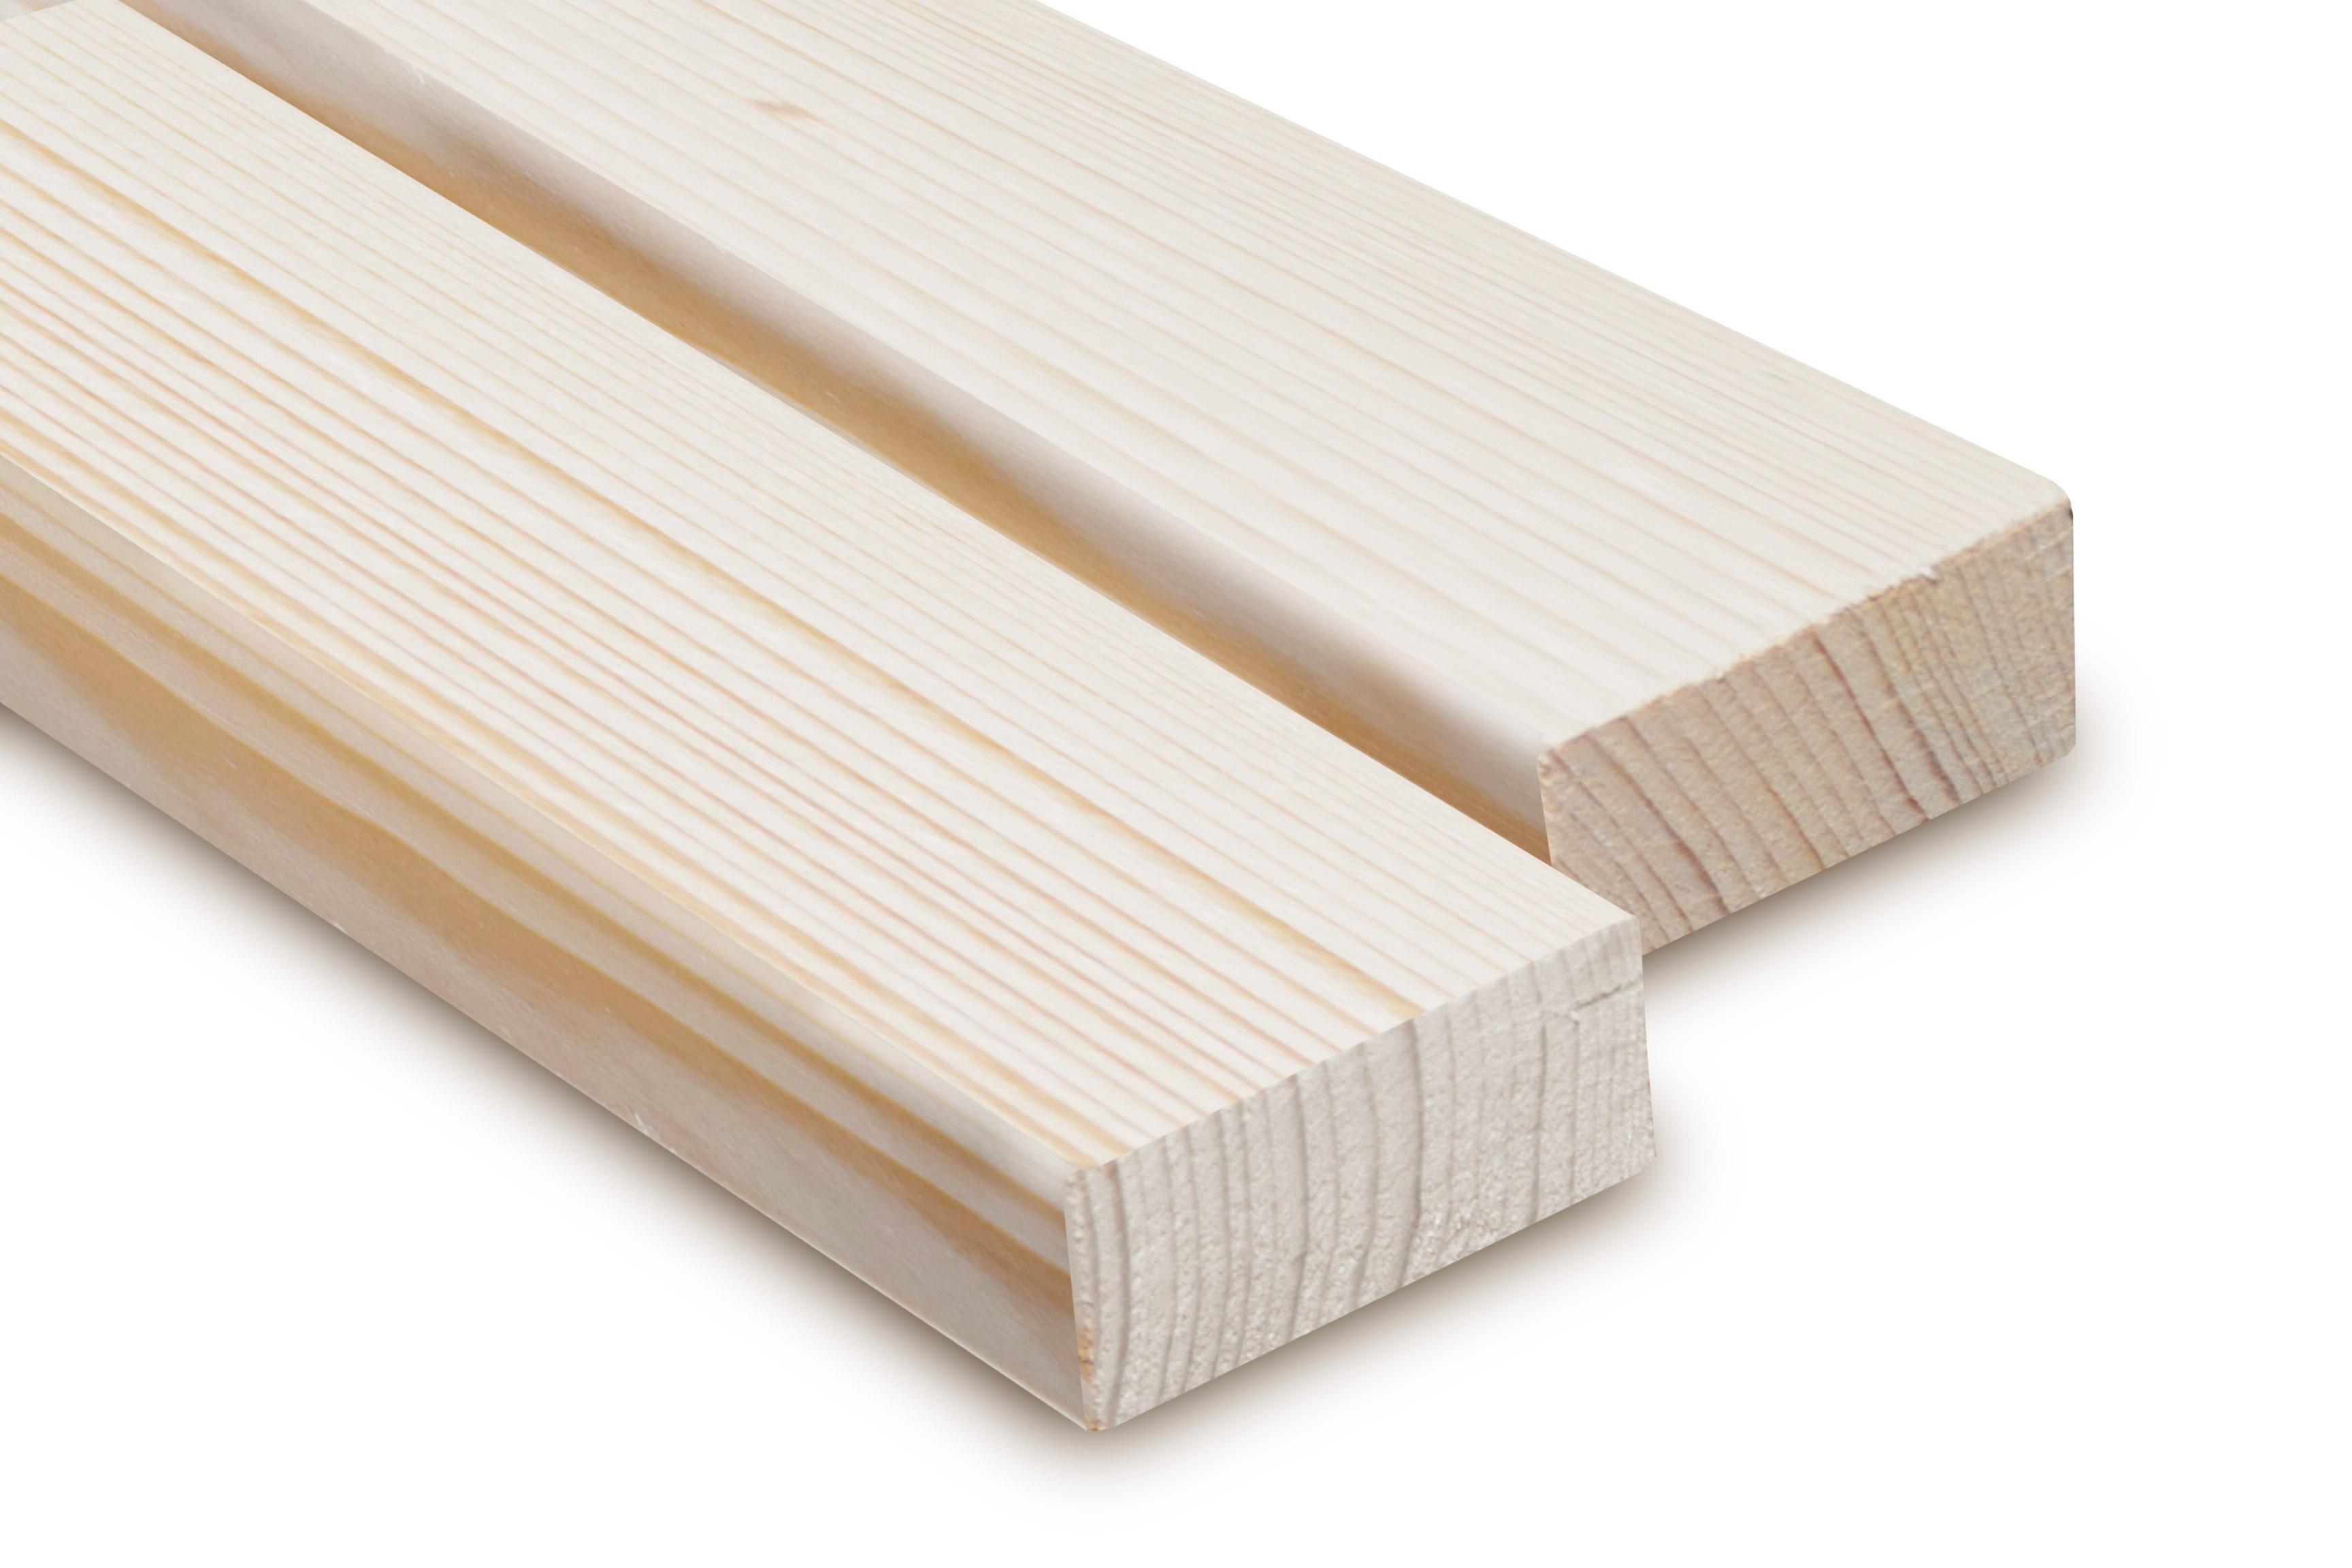 Pine Framework 18x45mm 2400mm